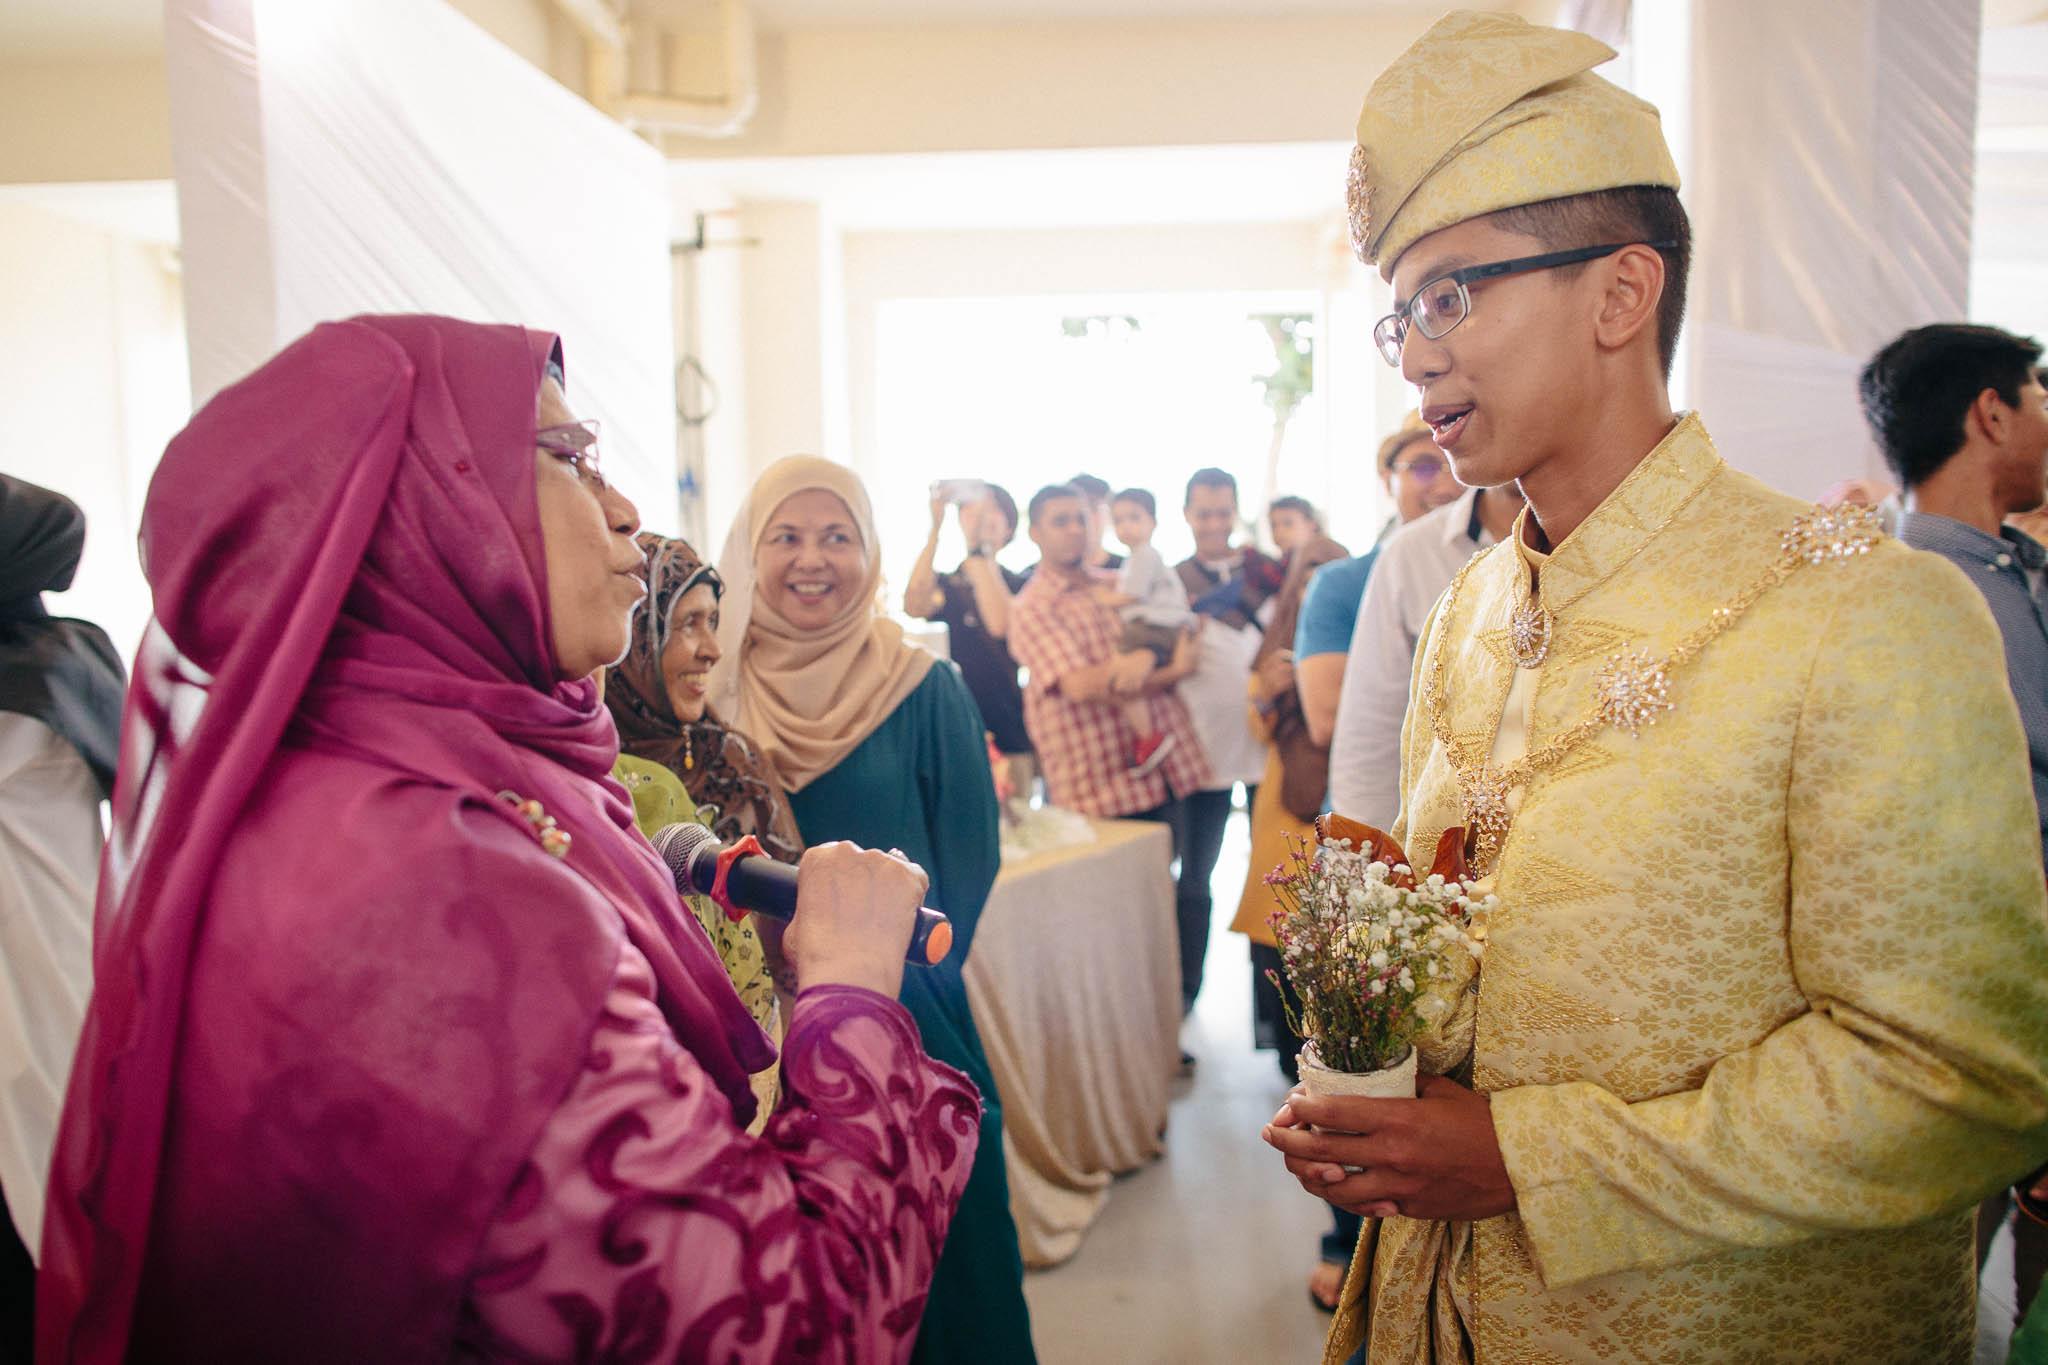 singapore-wedding-photographer-sharalyn-syazwan-032.jpg